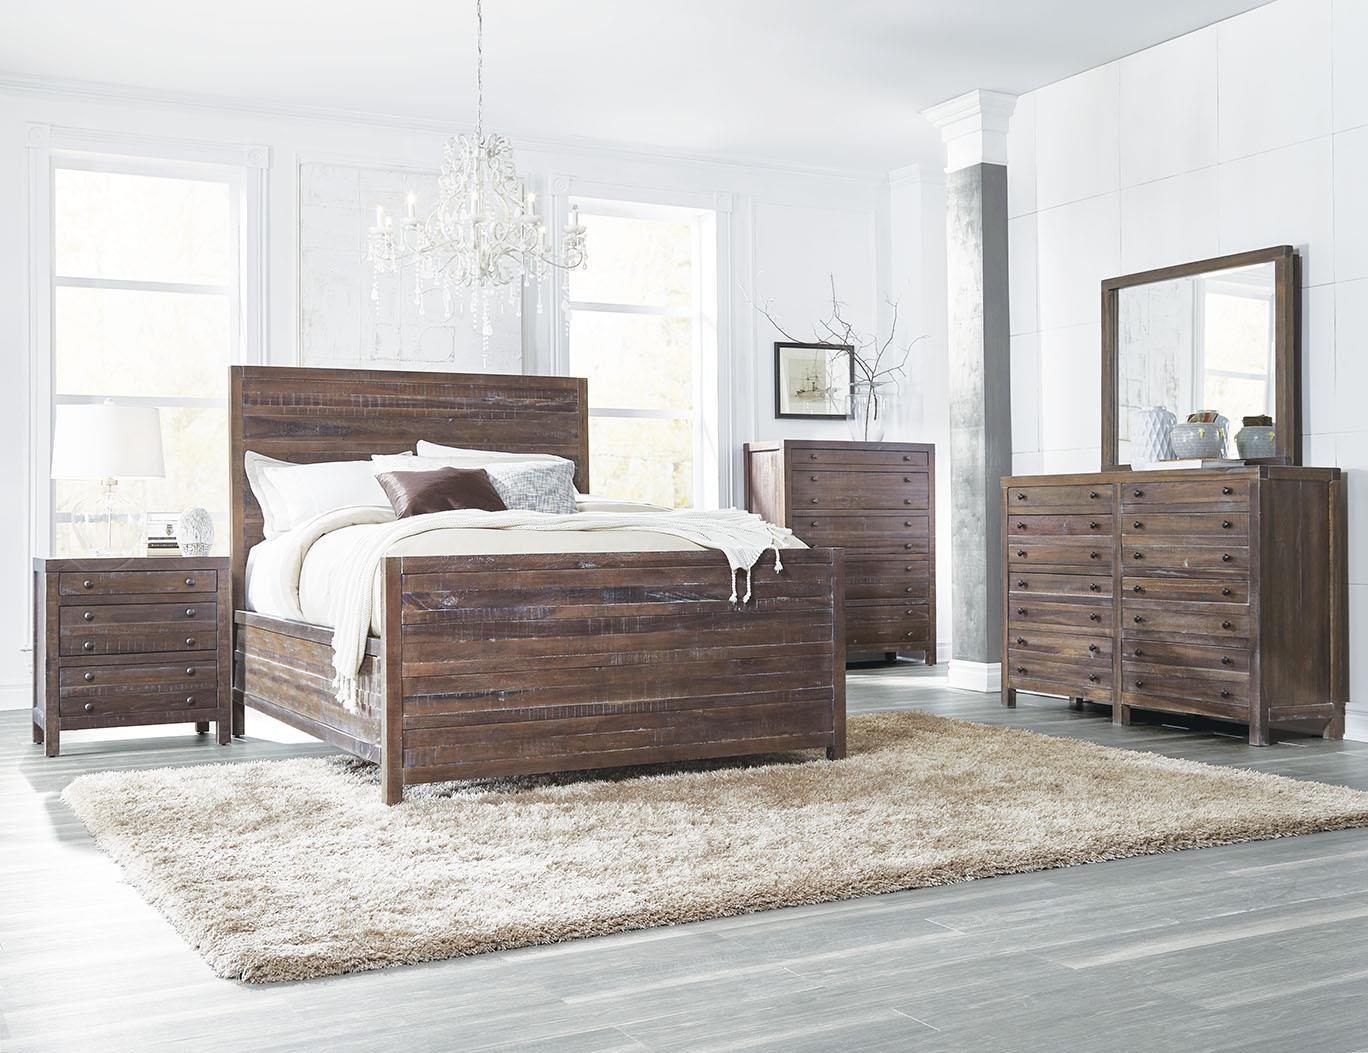 Trenton King 4 Piece Bedroom Set Ruby Gordon Furniture Mattresses Bedroom Groups